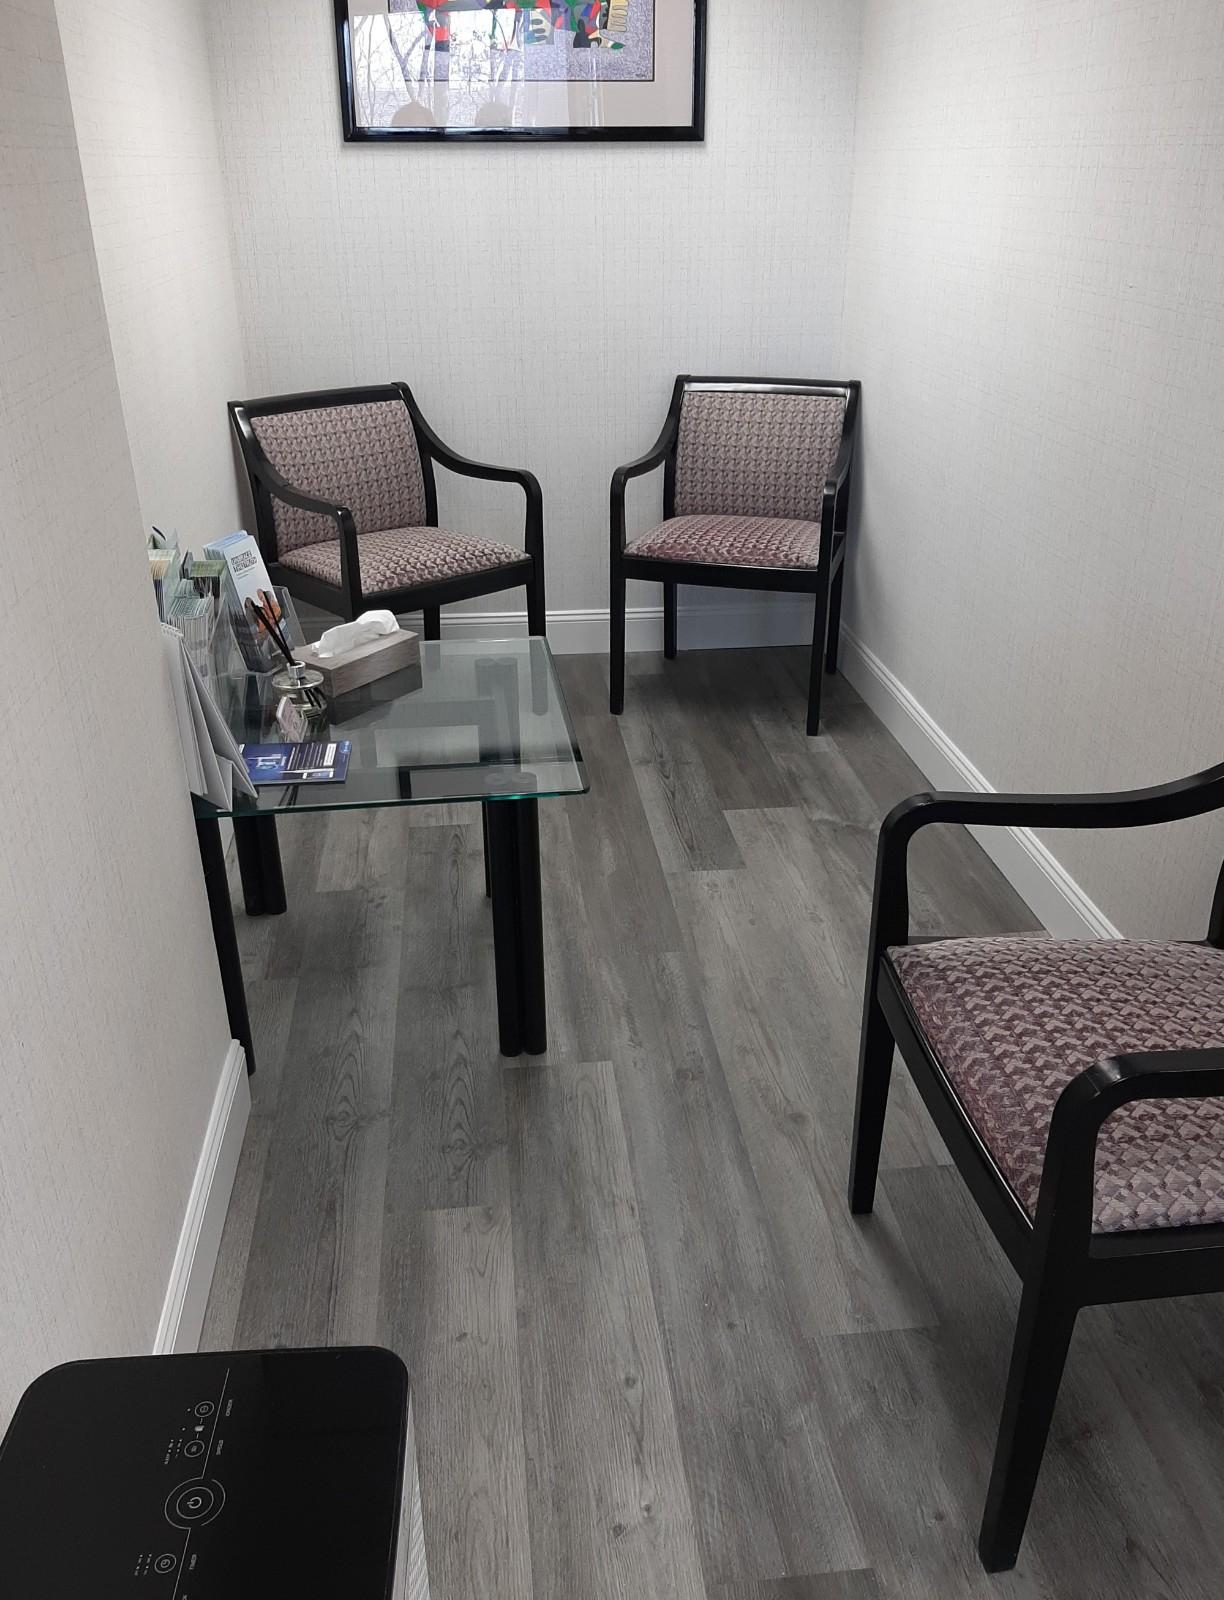 Glad Dental Relocated to New Dental Space in Pomona, New York